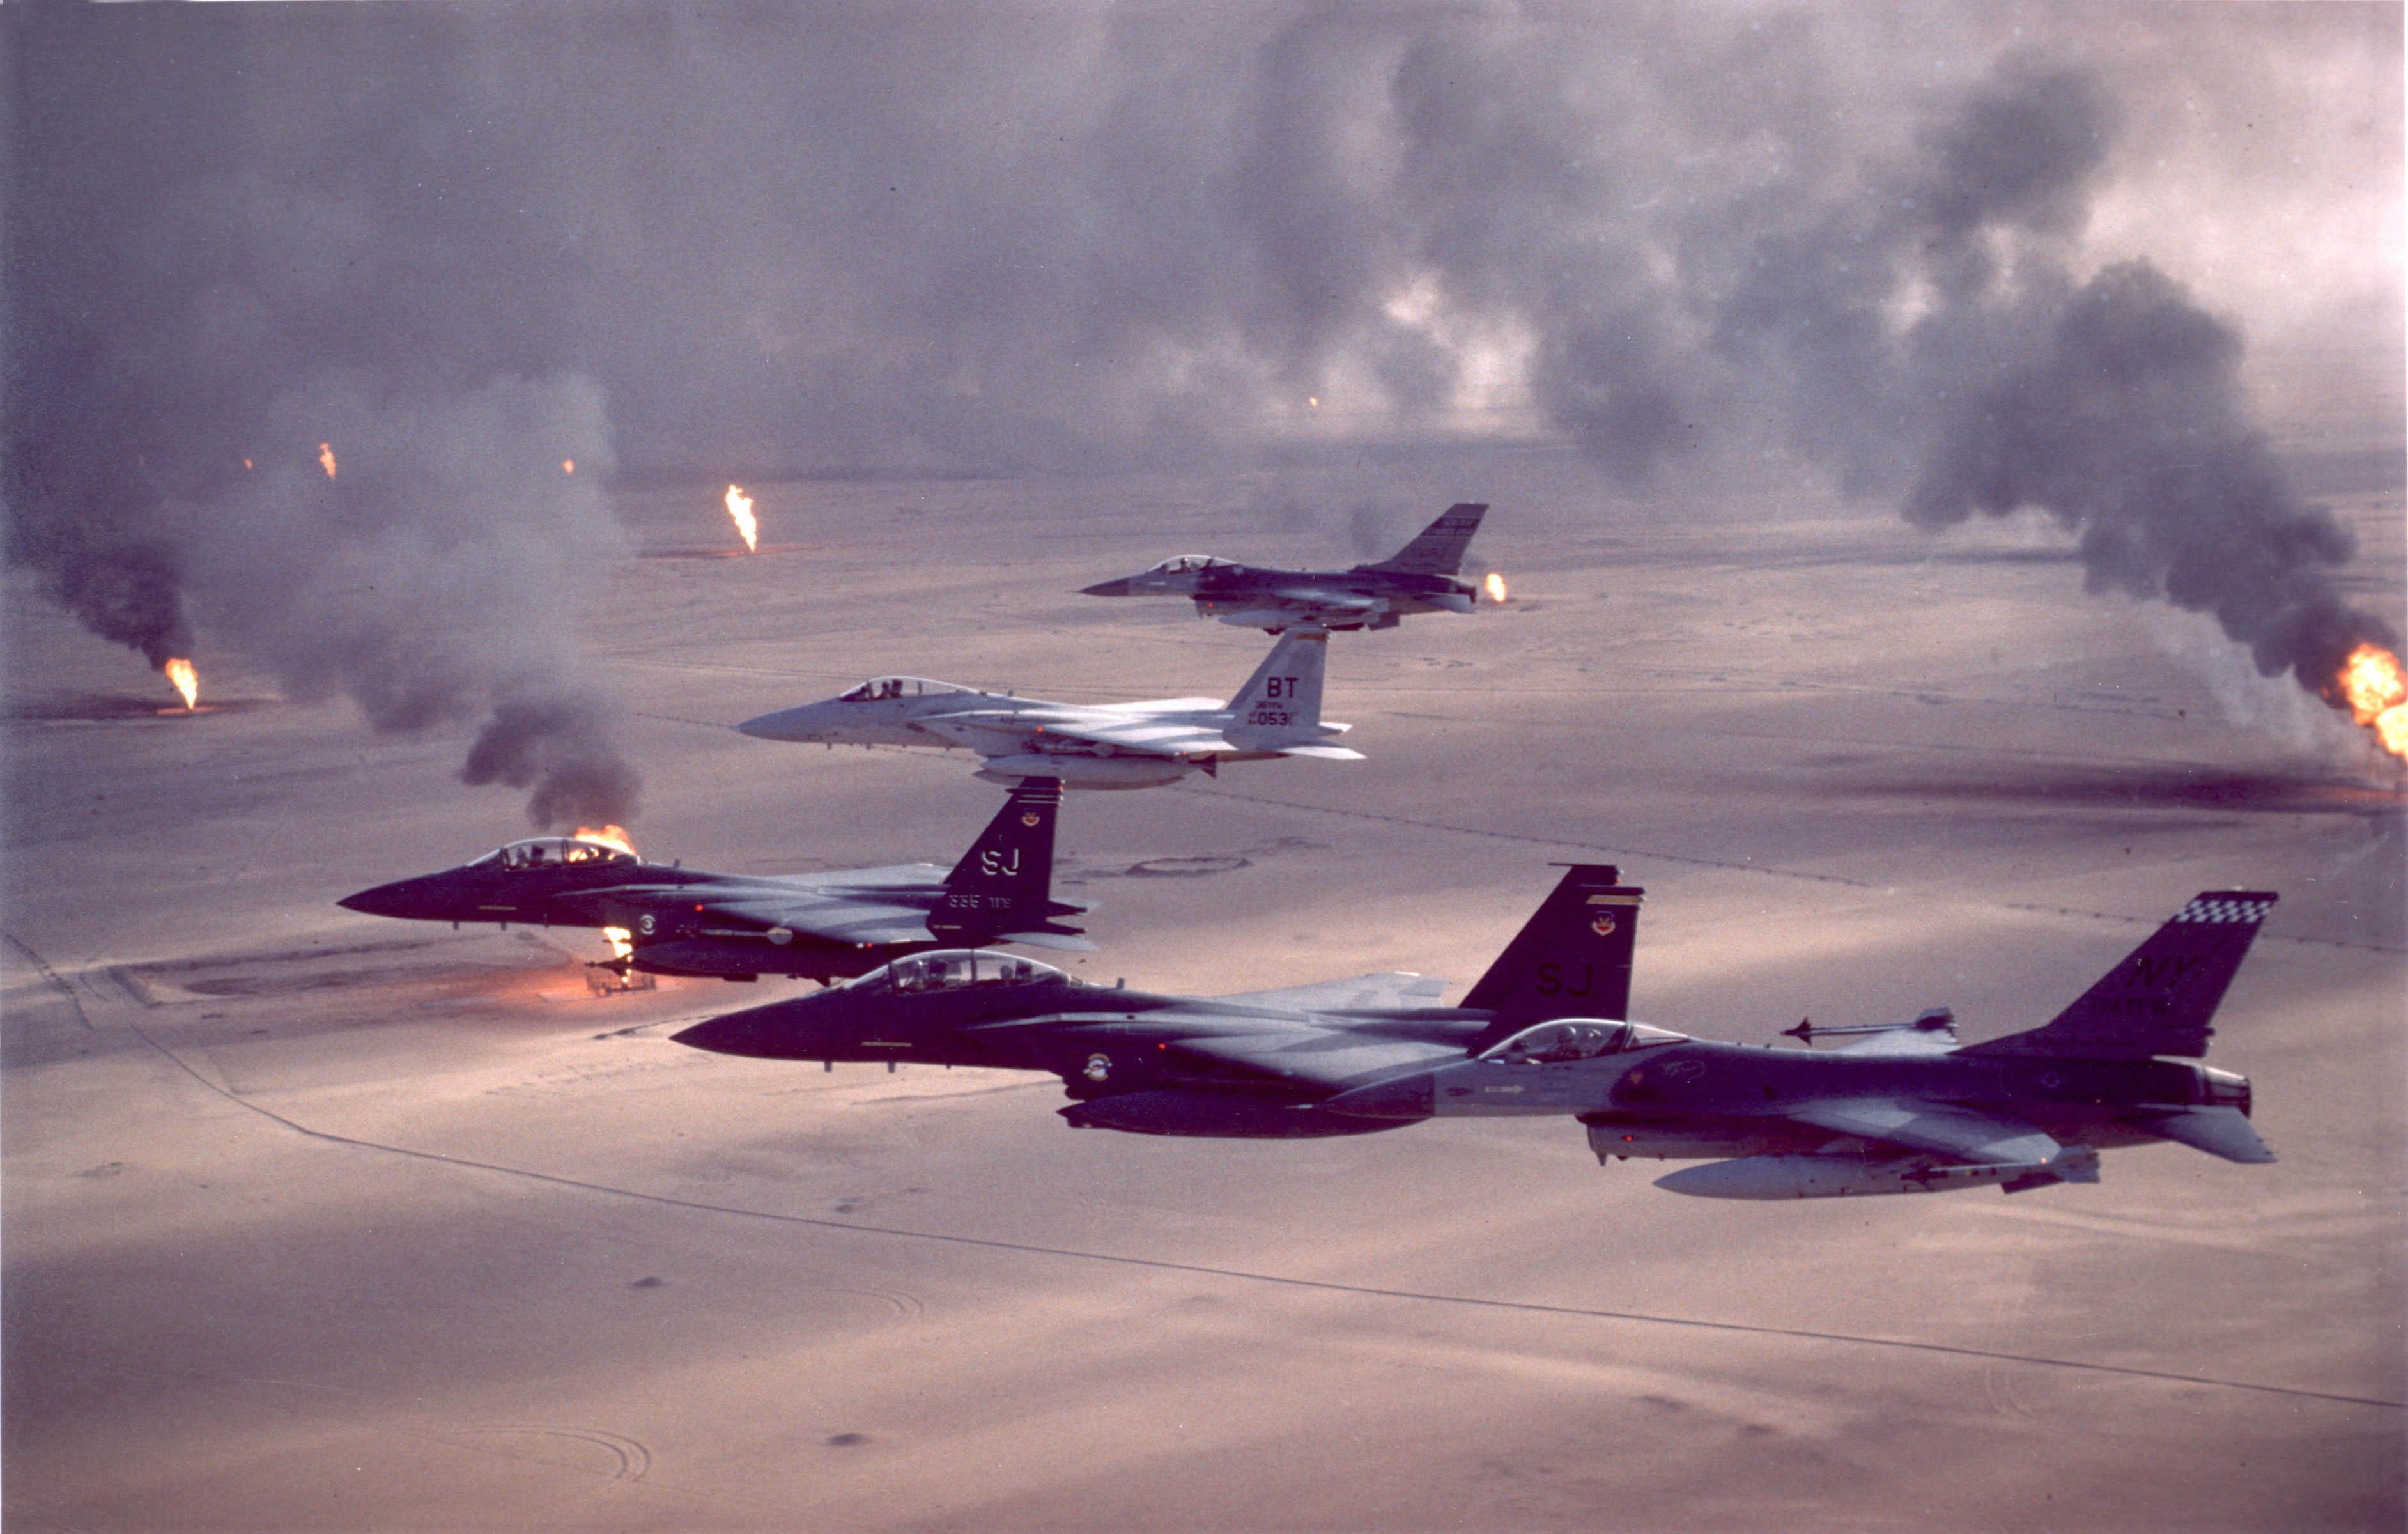 OPERATION DESERT SHIELD/DESERT STORM > 12th Air Force > Article.